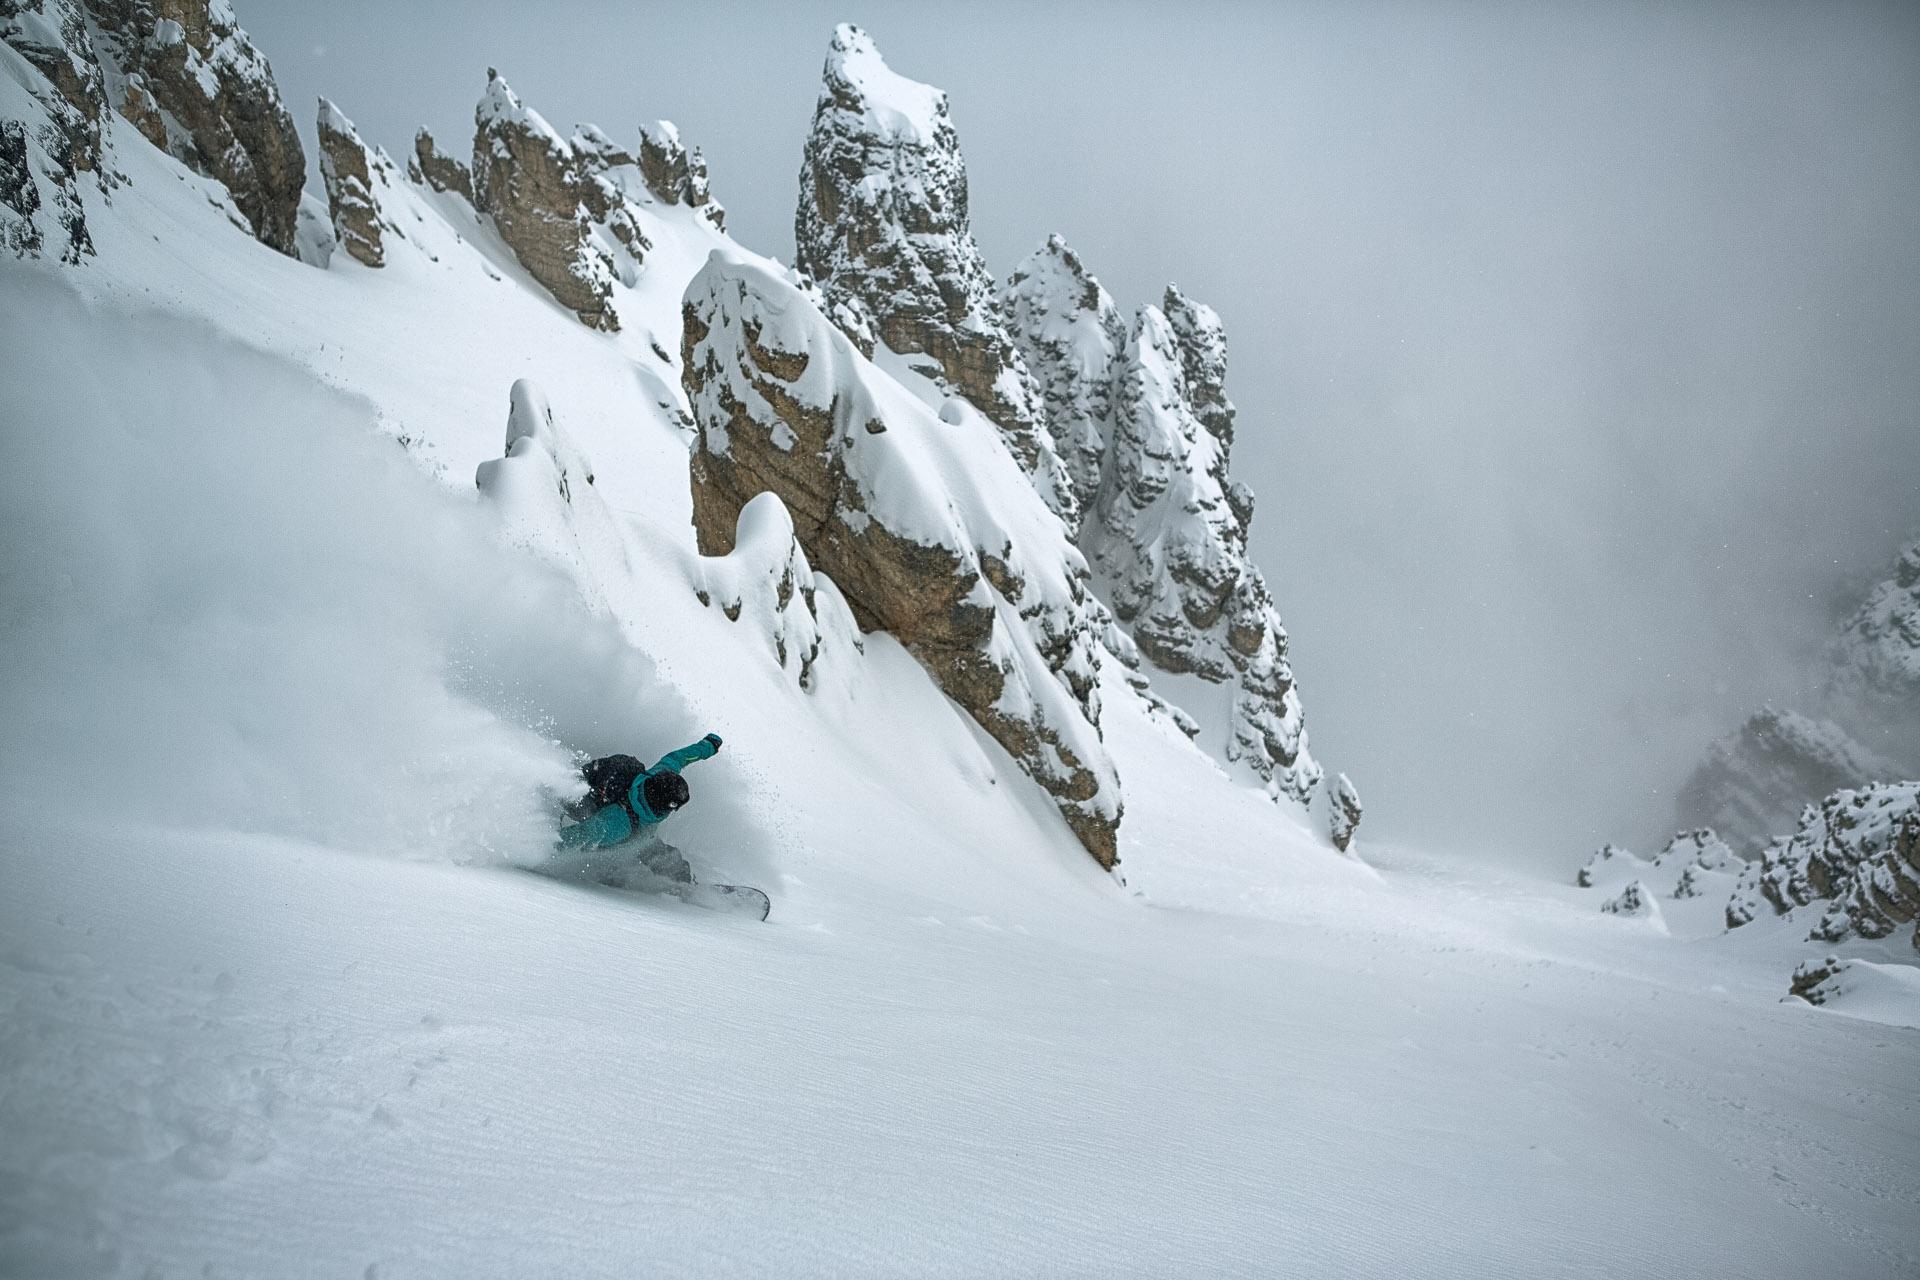 Maria DeBari, Dolomites, Italy